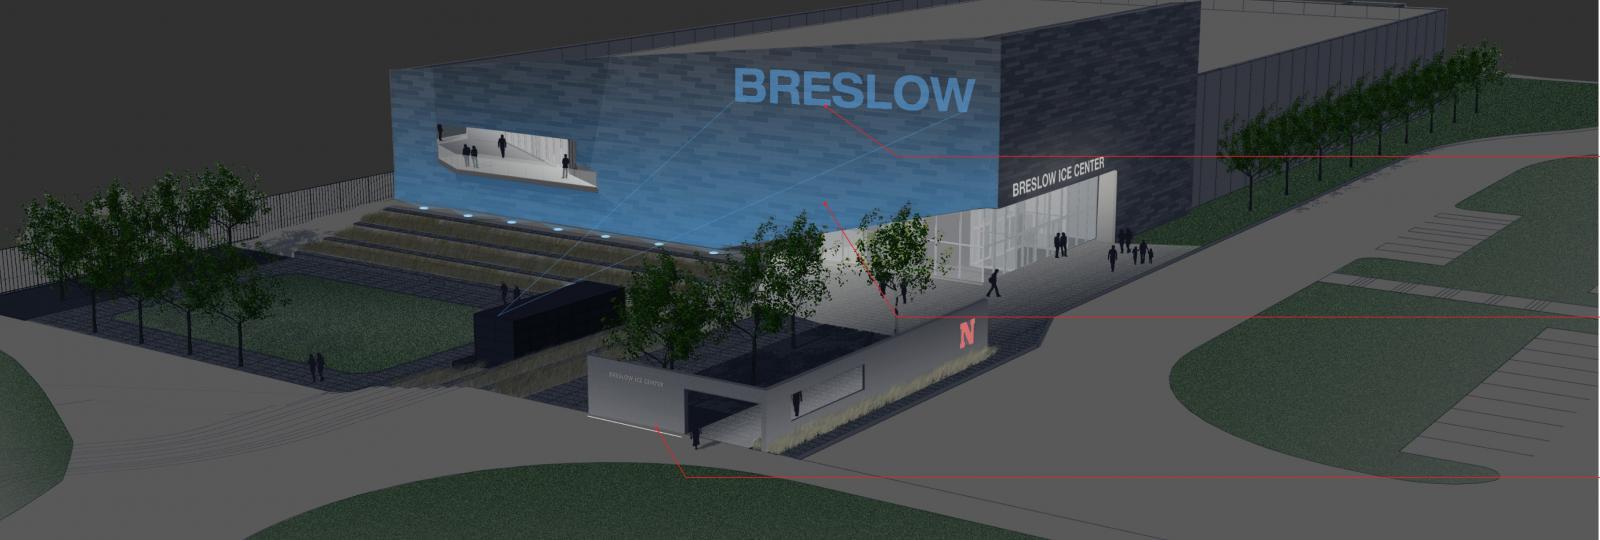 Night Breslow